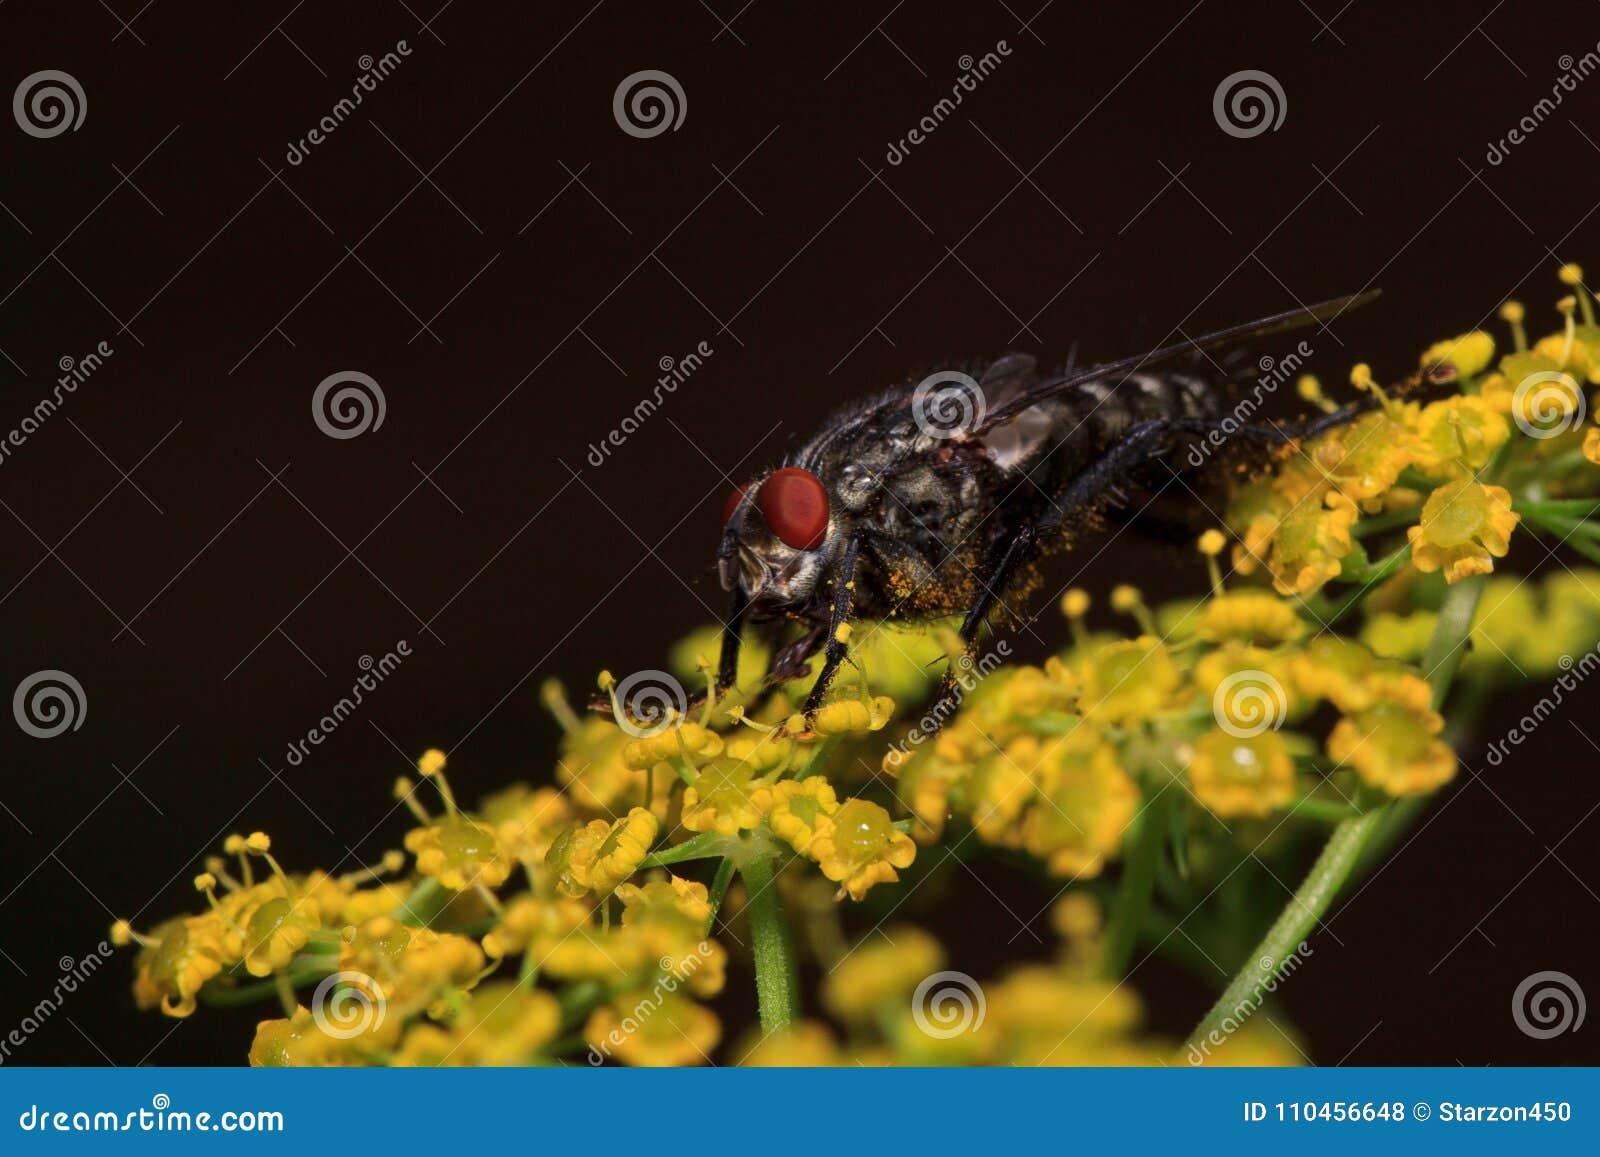 Flugan sitter på små gula blommor Djur i djurliv